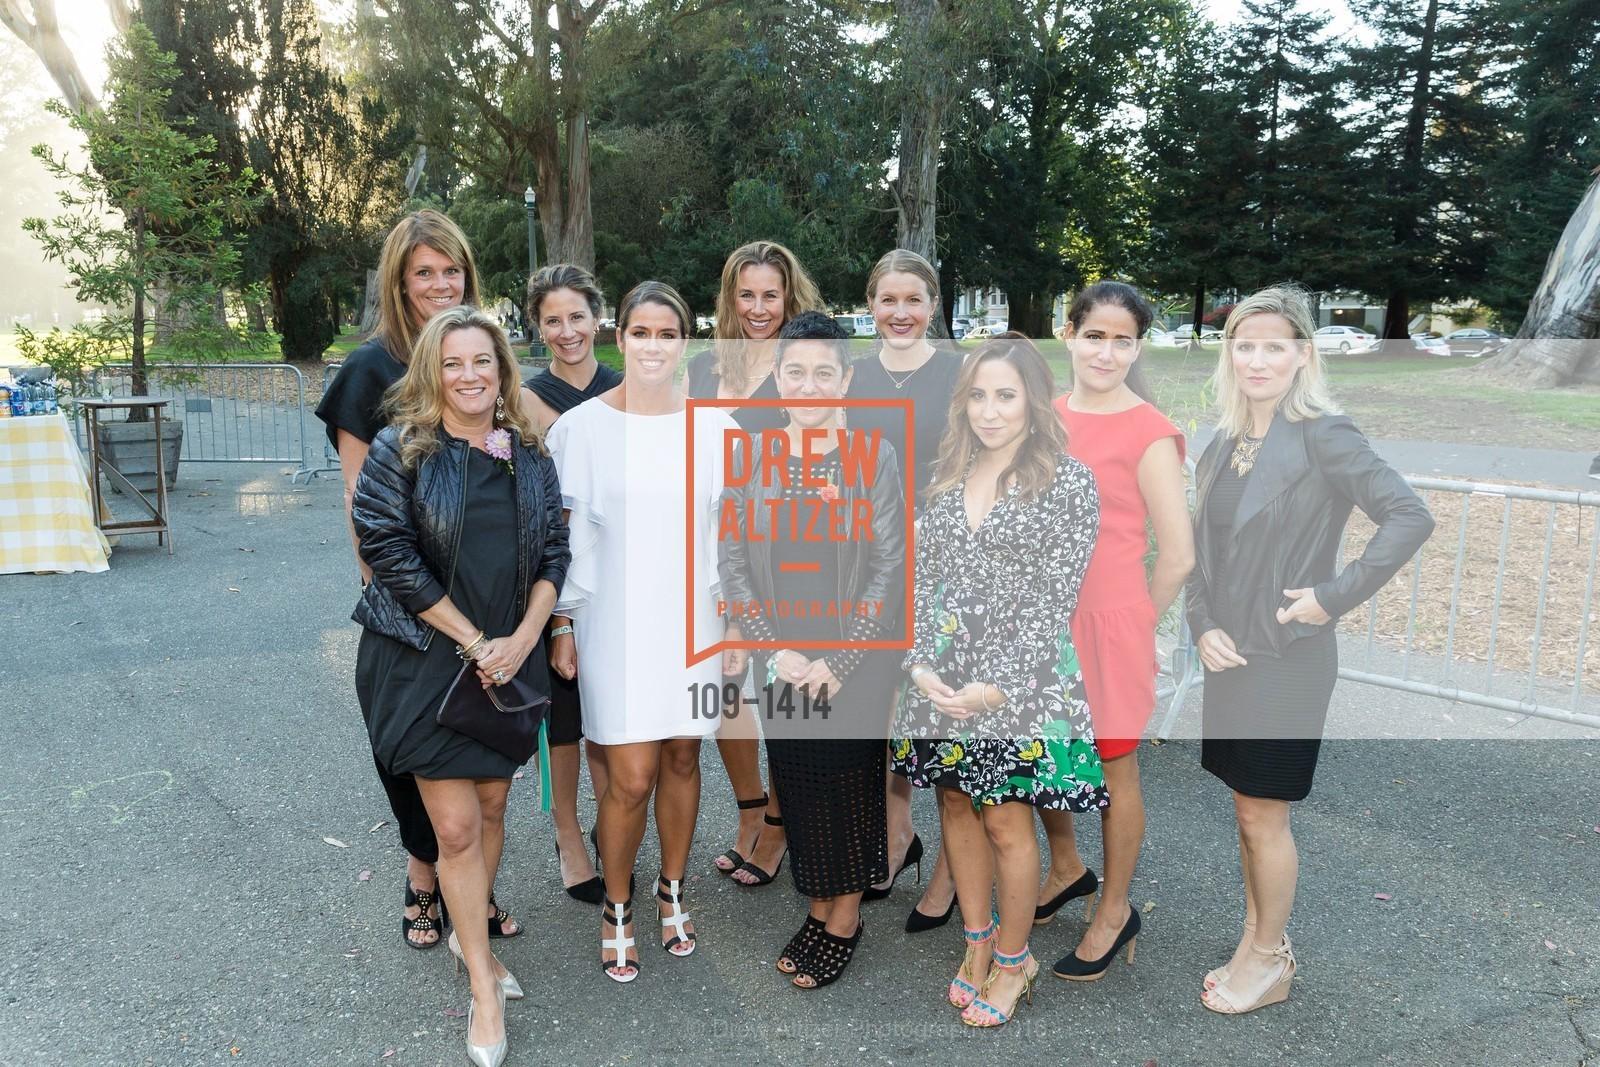 Christine Gardner, Sophie Hayward, Gina Eggert, Caroline Brinckerhoff, Martine Krumholz, Katie Khasigian, Carolyn Edwards, Liz Farrell, Emily Ginsburg, Mather Martin, Photo #109-1414